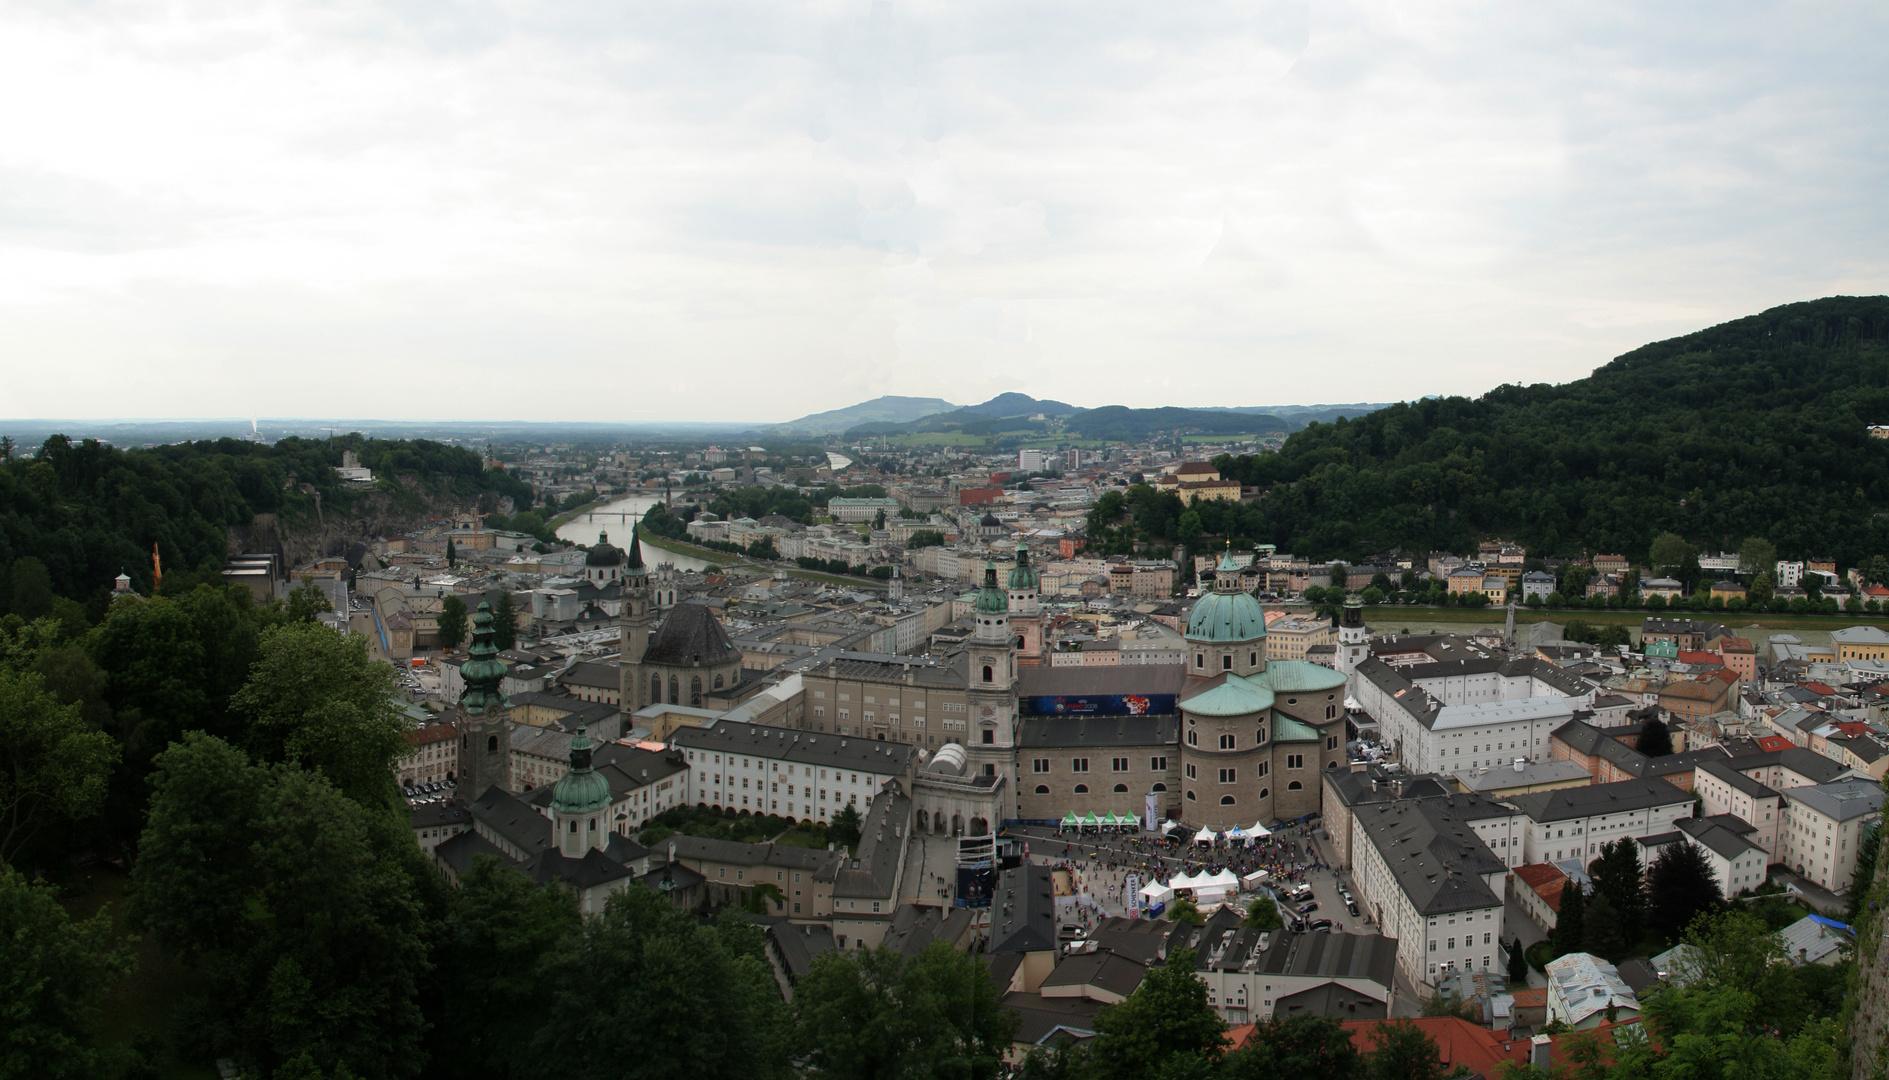 Panorama des Salzburg